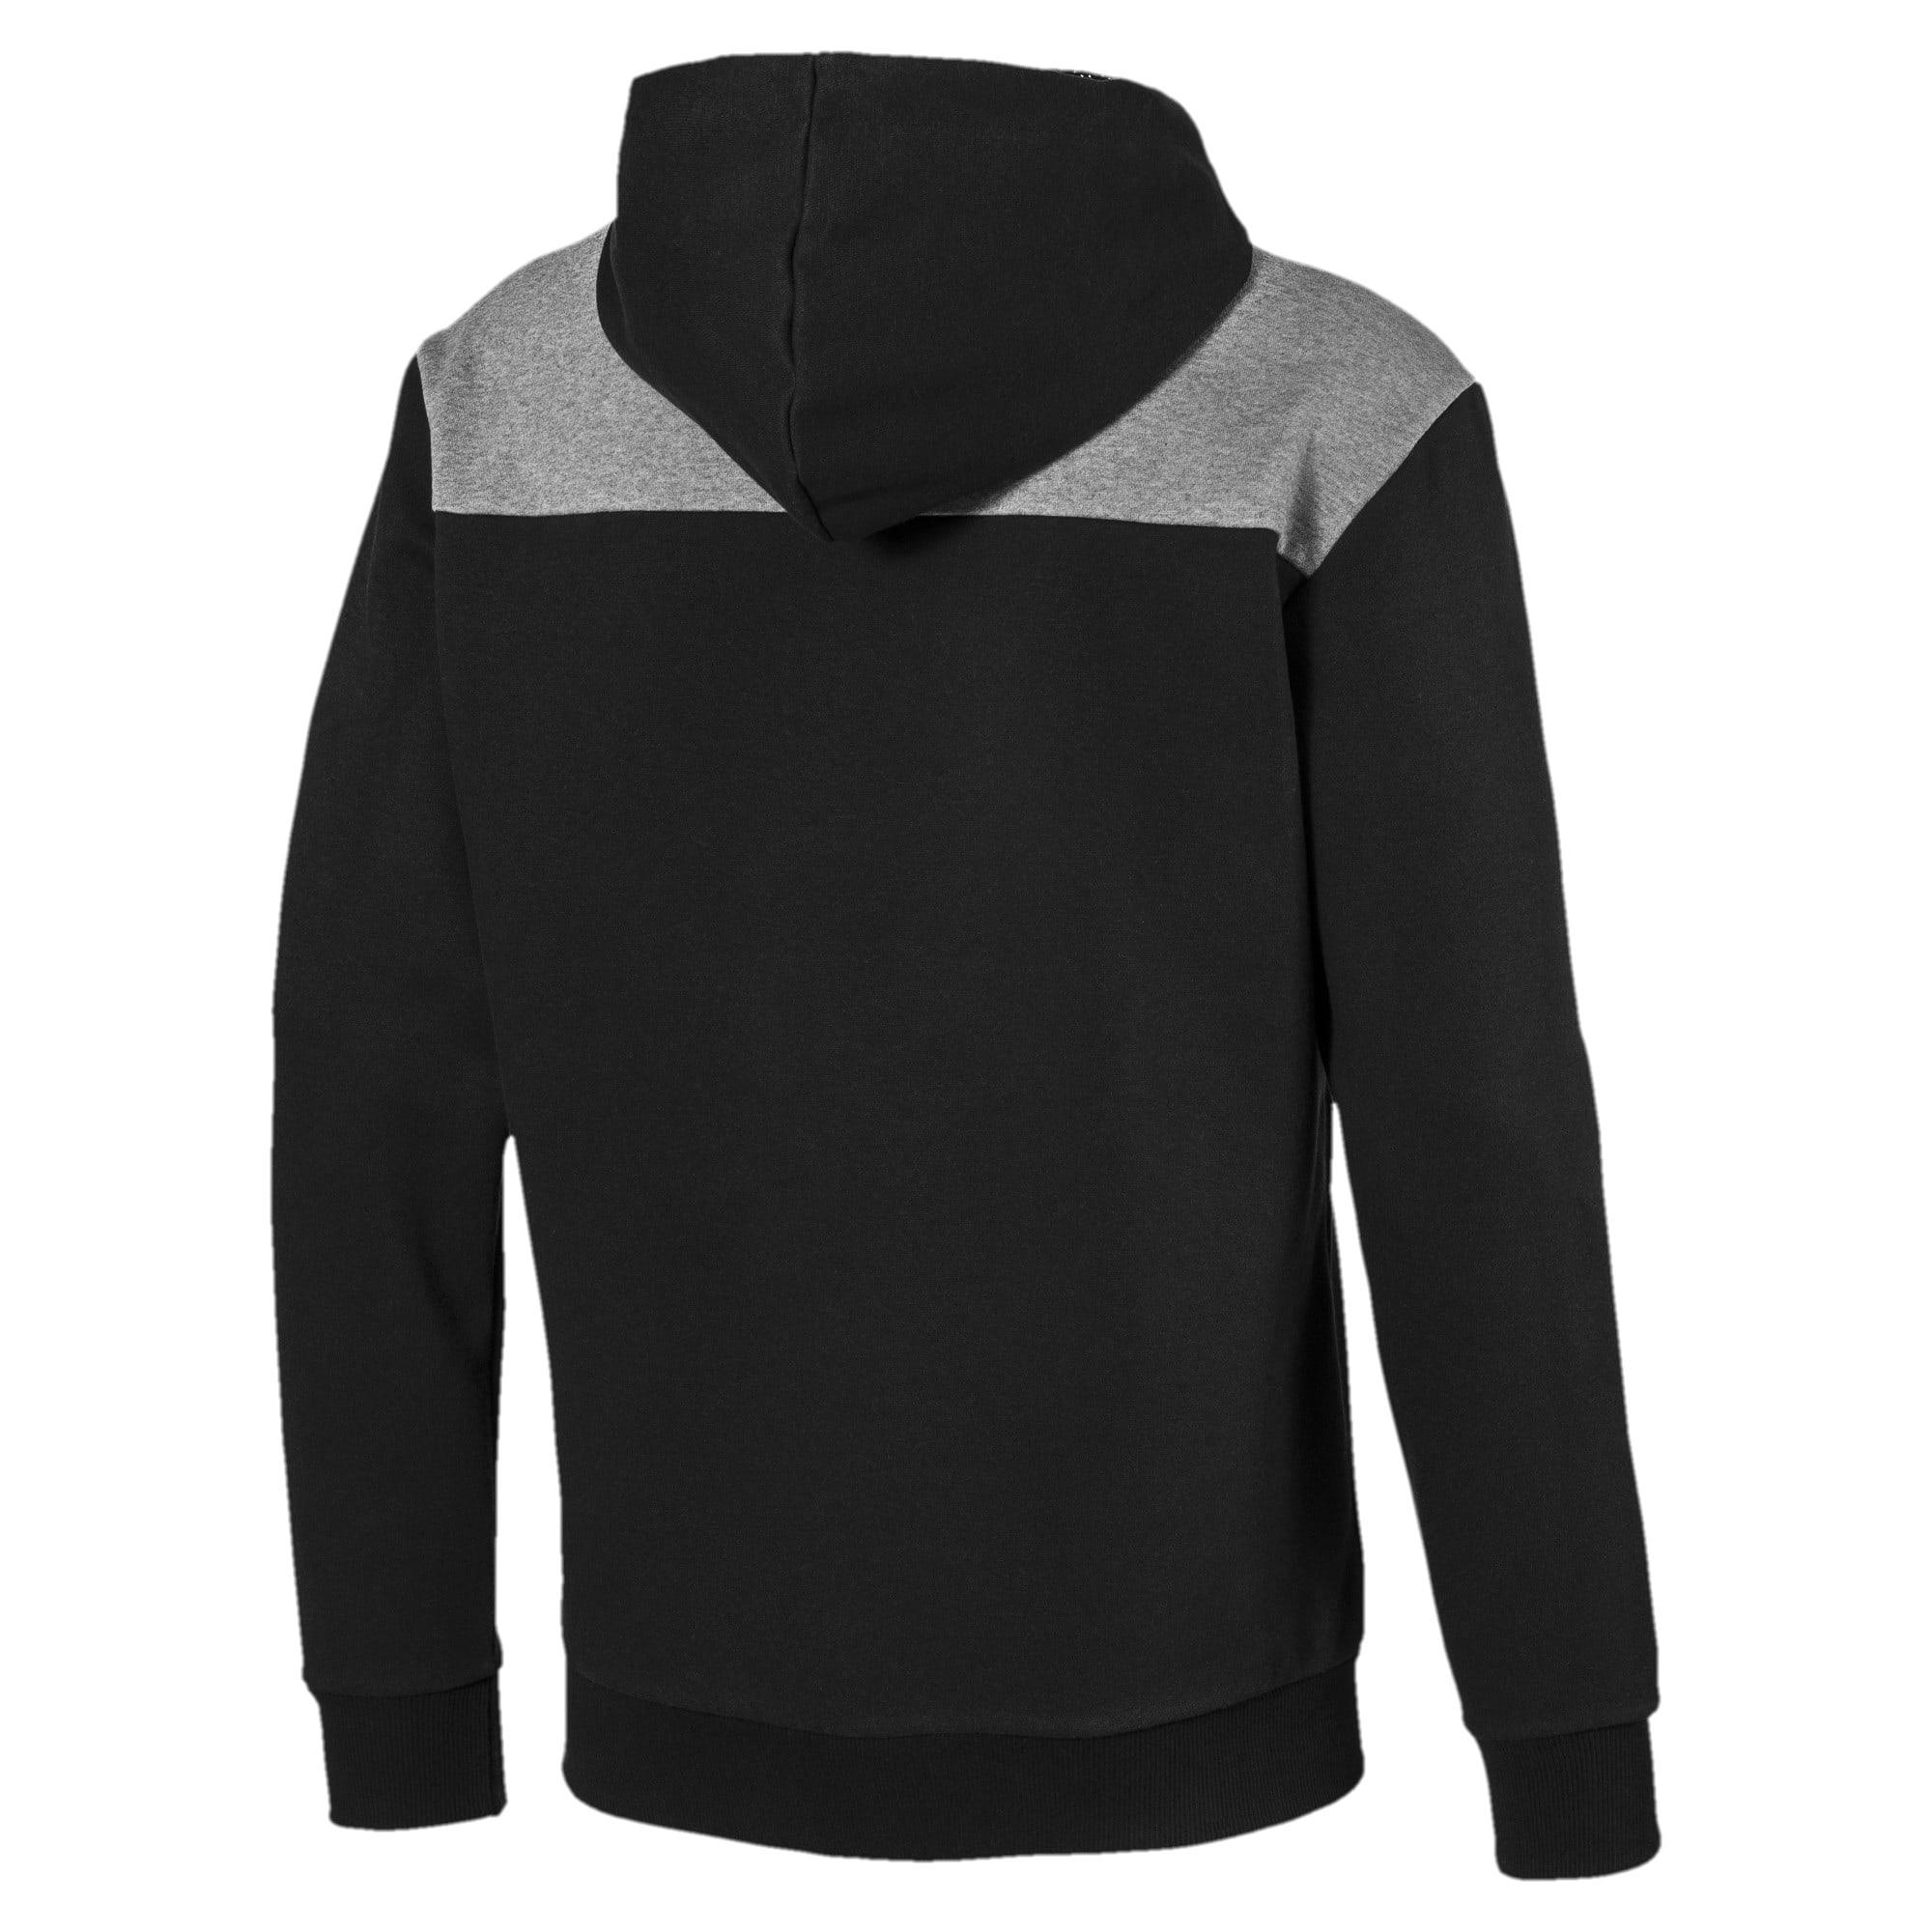 Thumbnail 6 of Modern Sports Men's Fleece Hoodie, Puma Black, medium